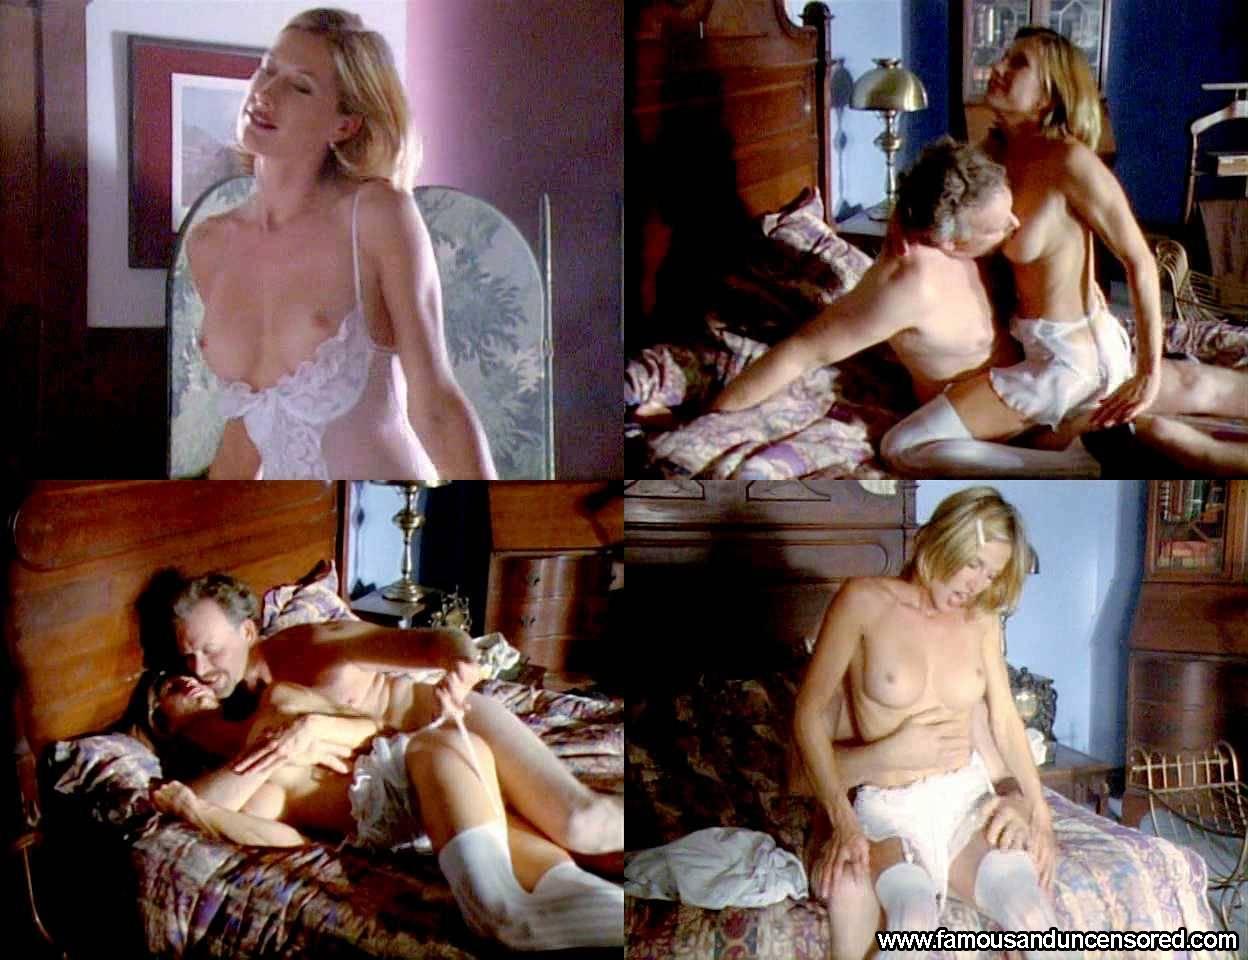 Lena paul carmen caliente steve holmes make it naked (91 pics)